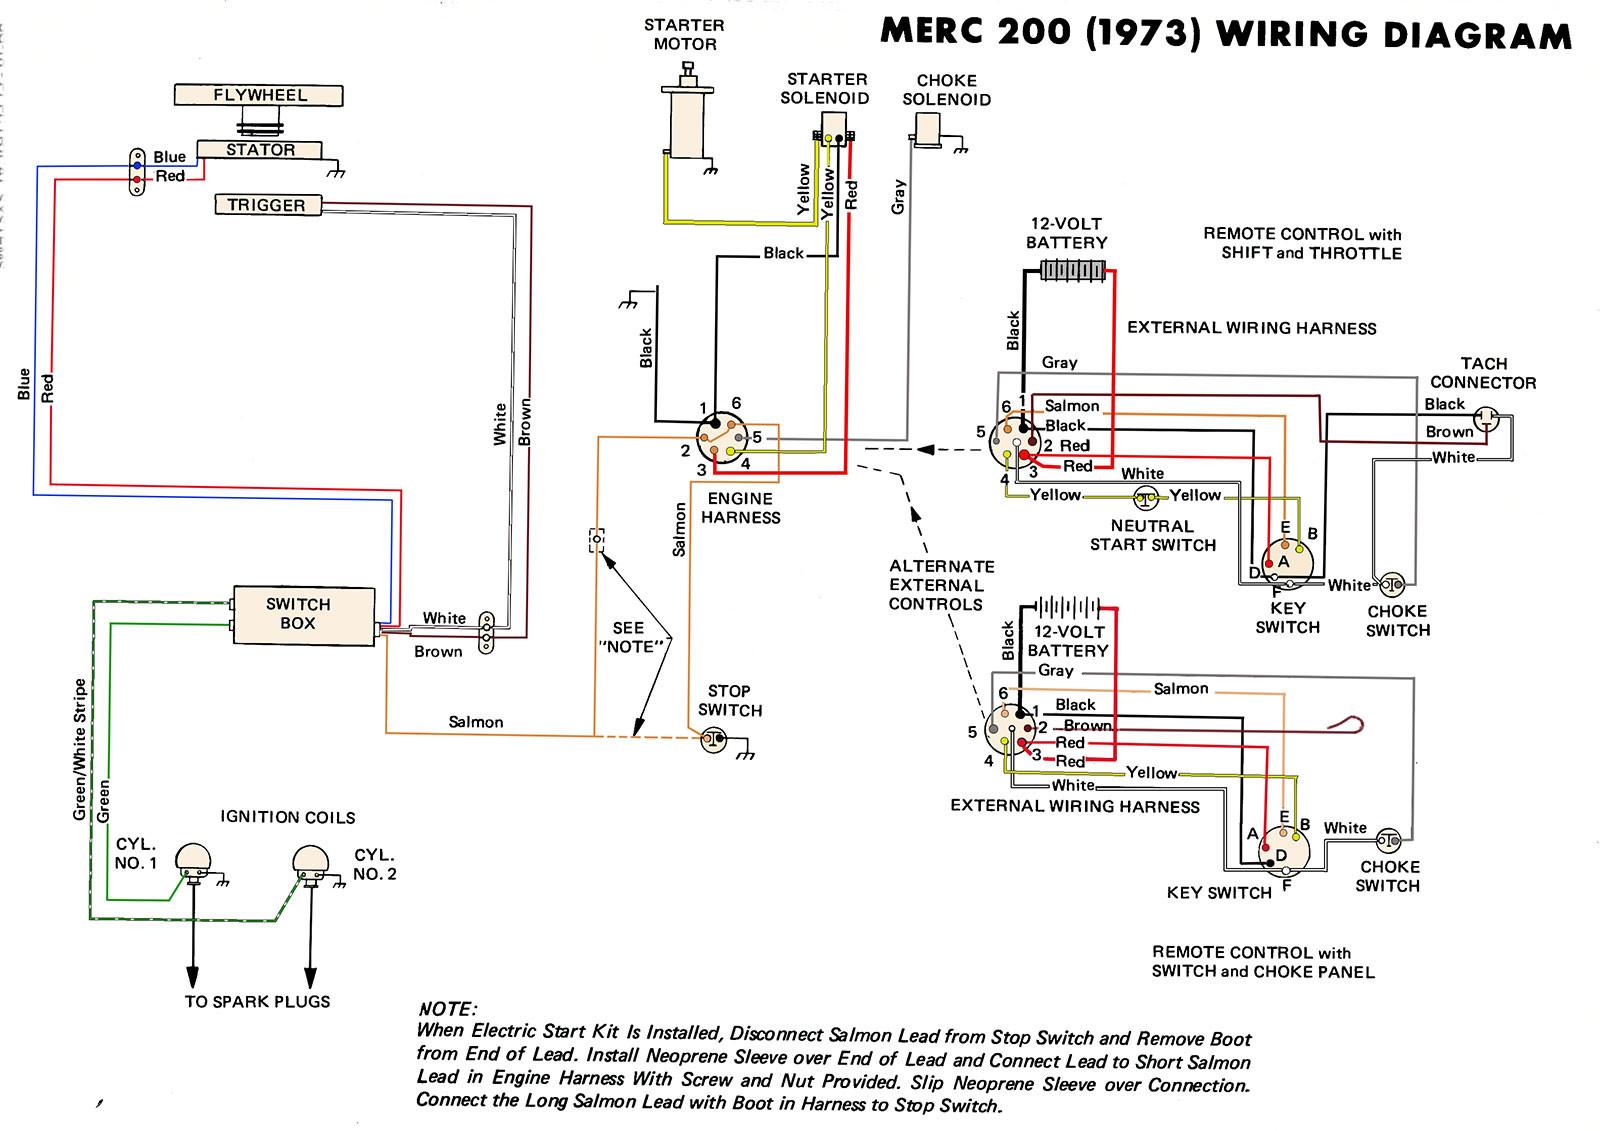 Wiring Diagrams 4 Stroke Motor Diagram] Mercury 4 Stroke Wiring Diagram Full Version Hd Quality … Of Wiring Diagrams 4 Stroke Motor